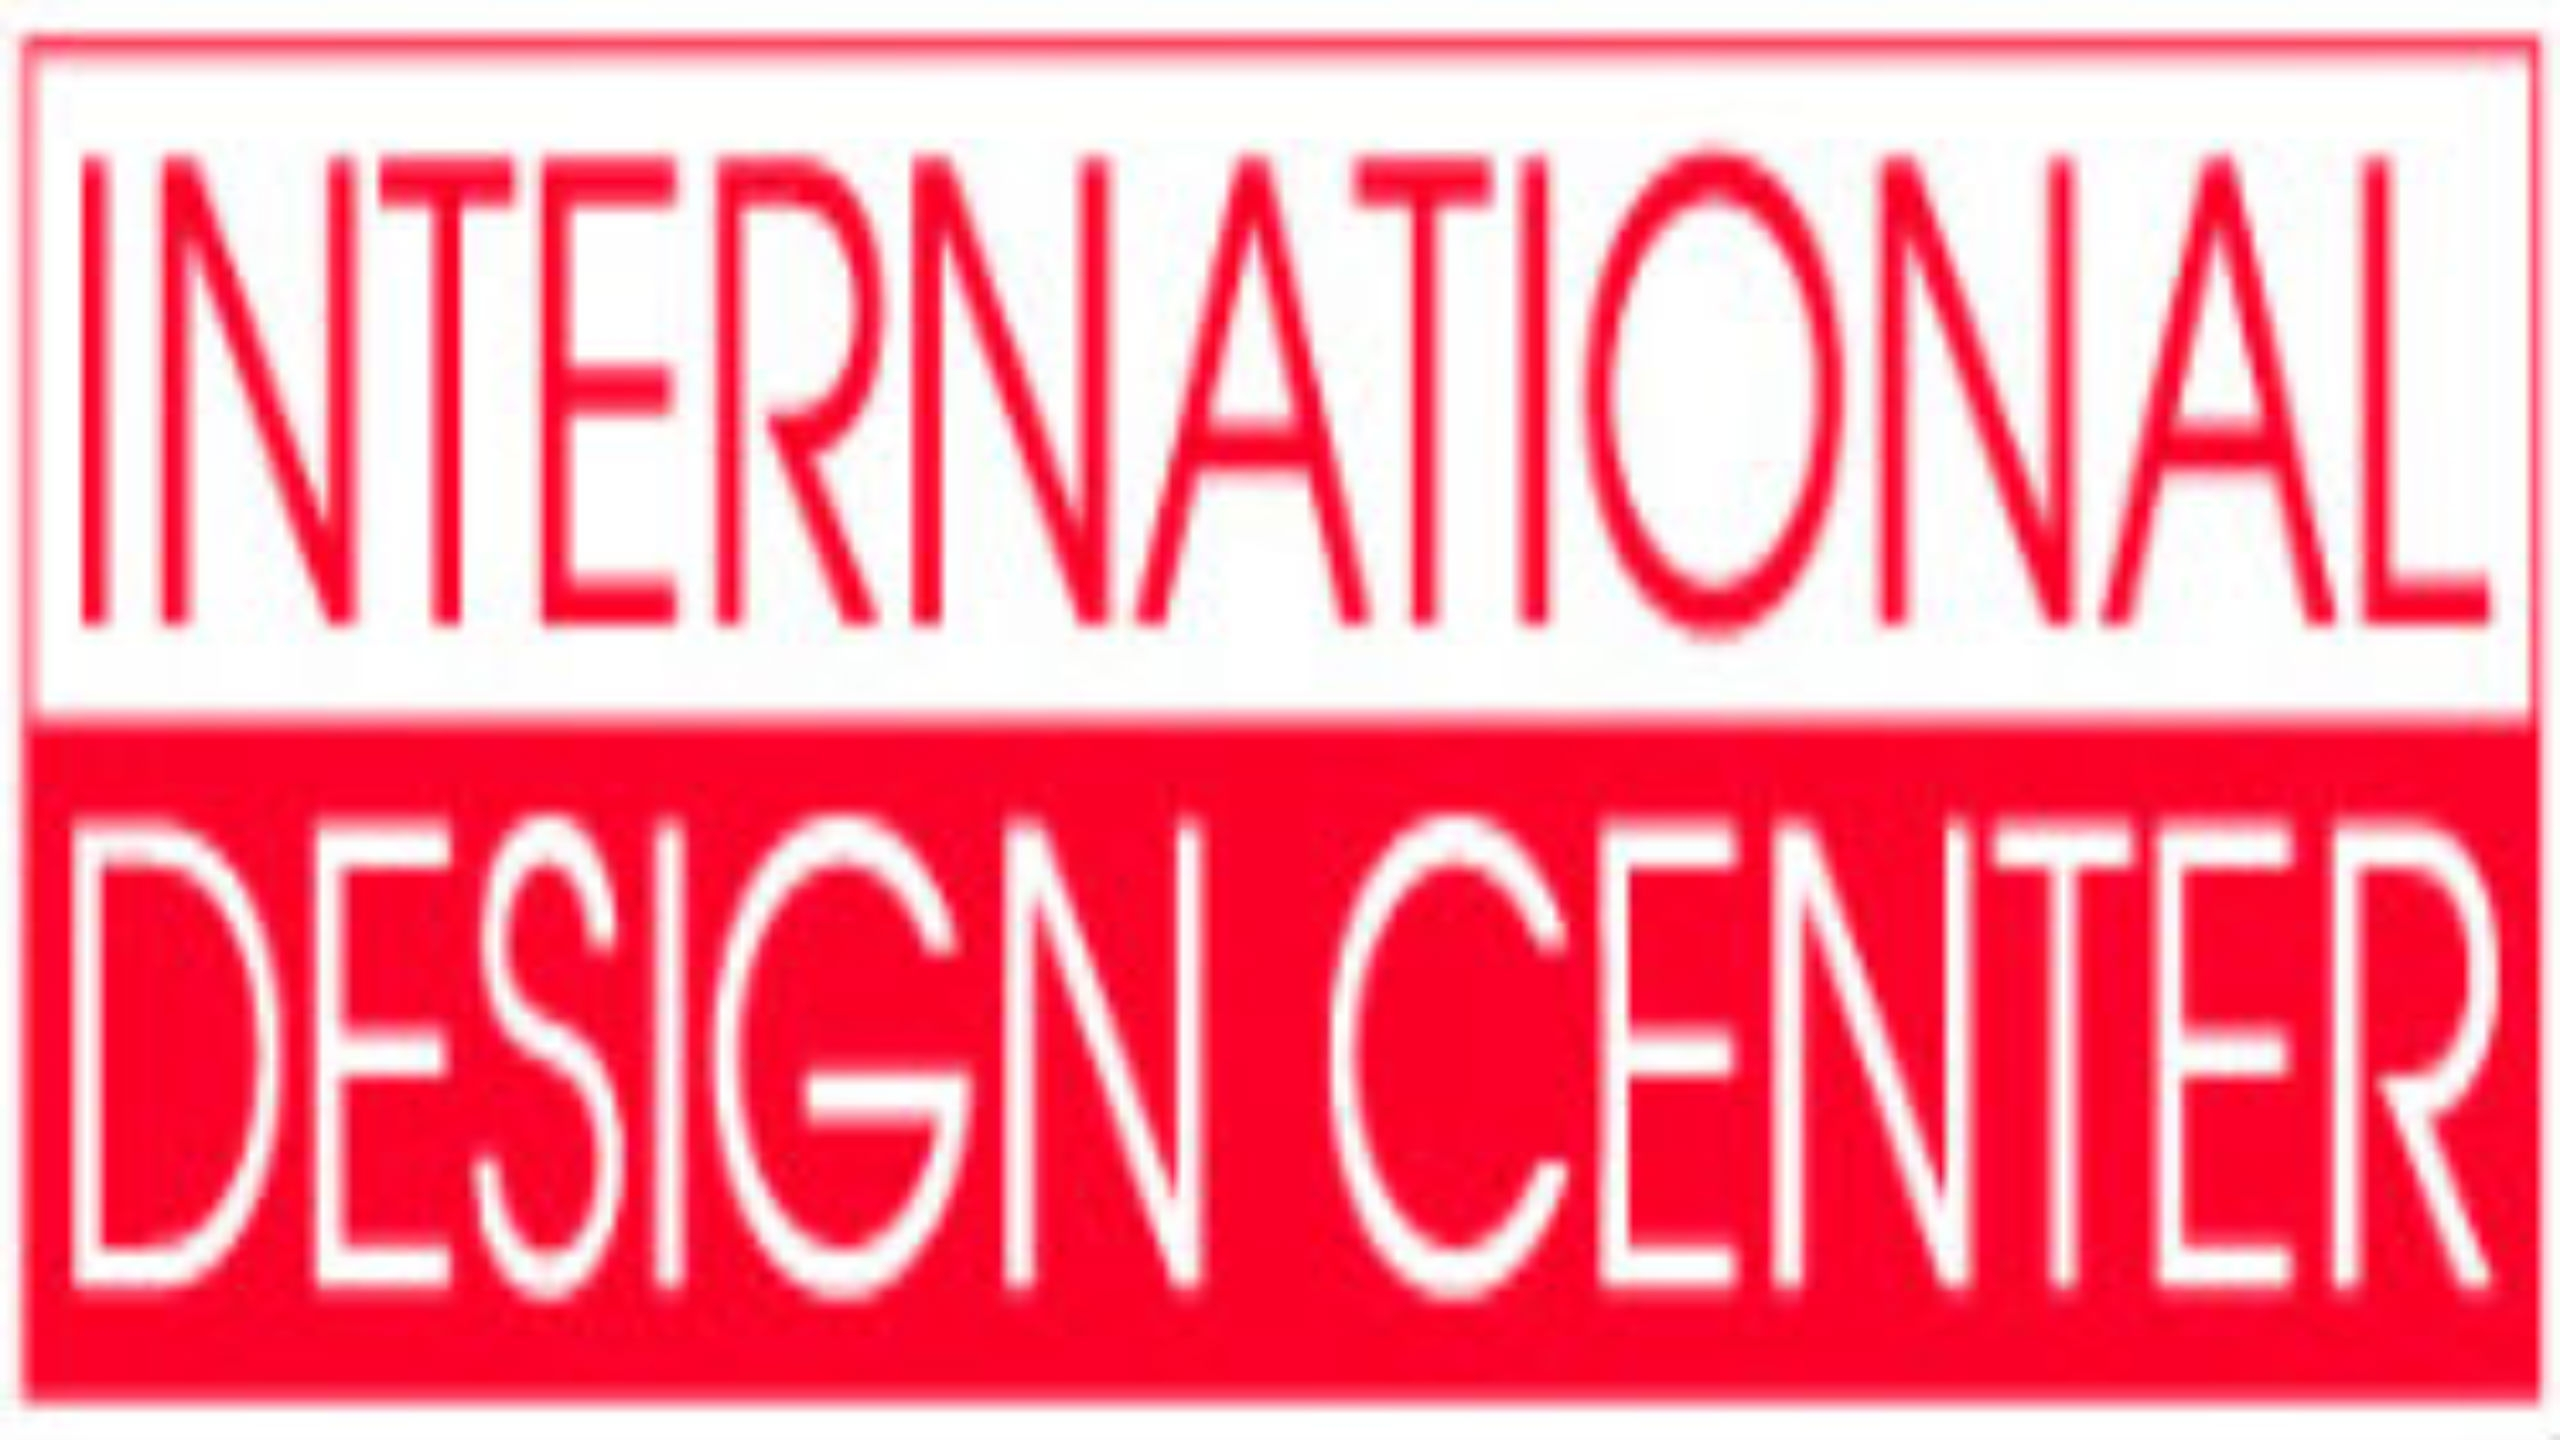 International Design Center (@idcmn) Cover Image